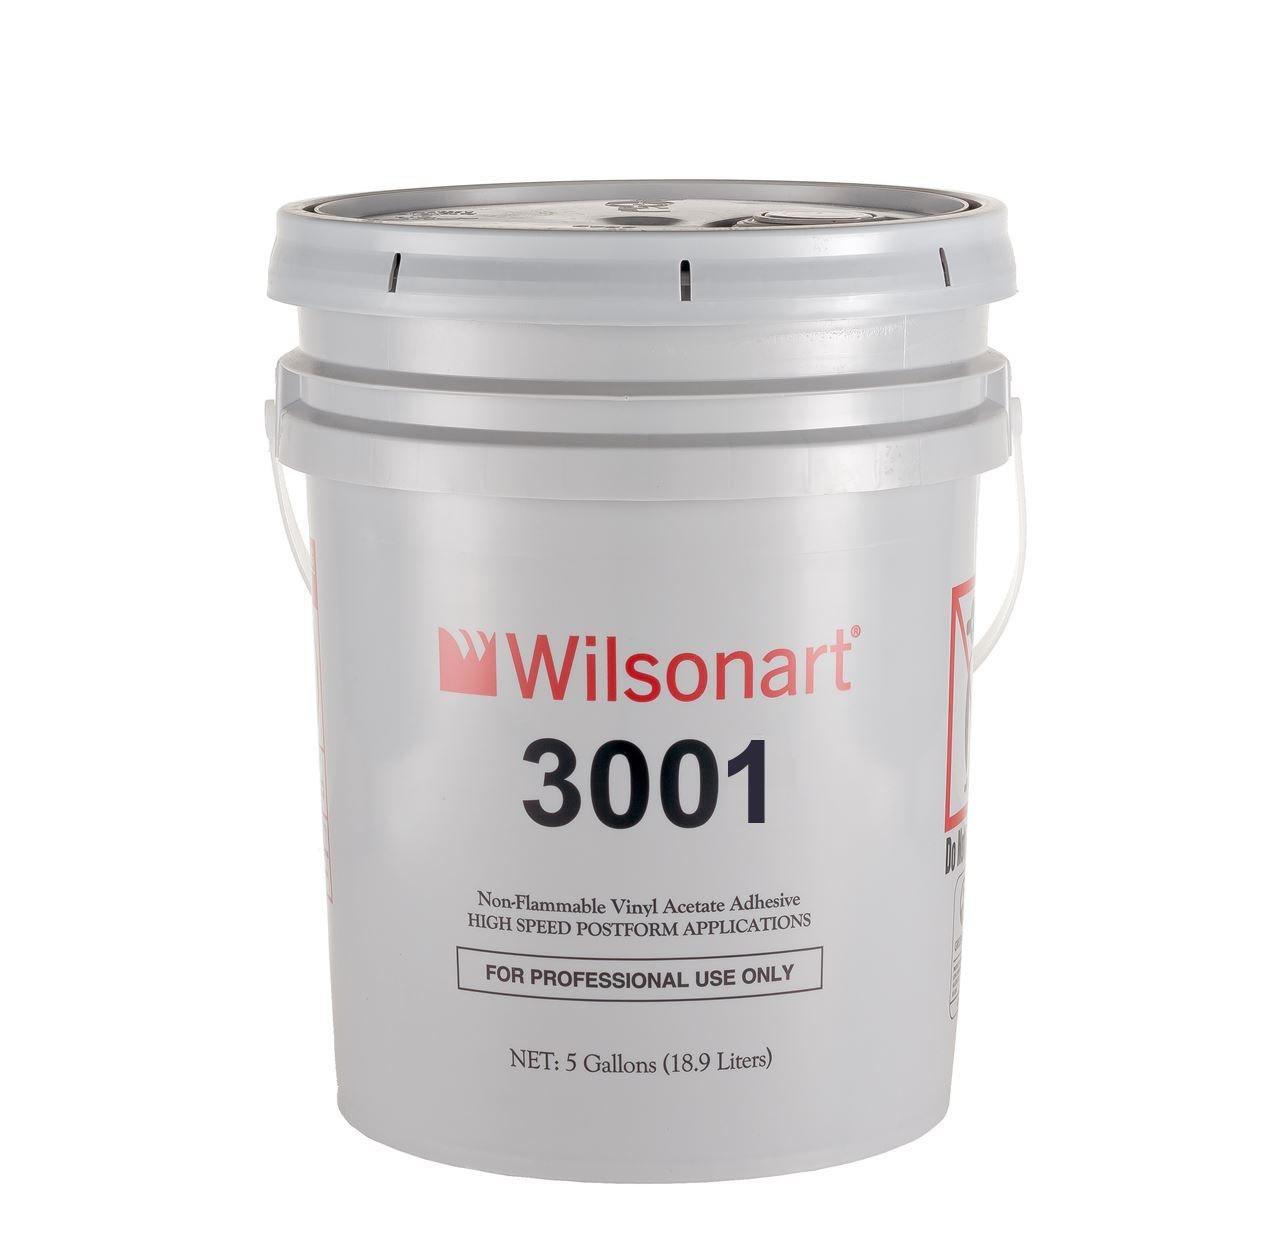 WA 3001